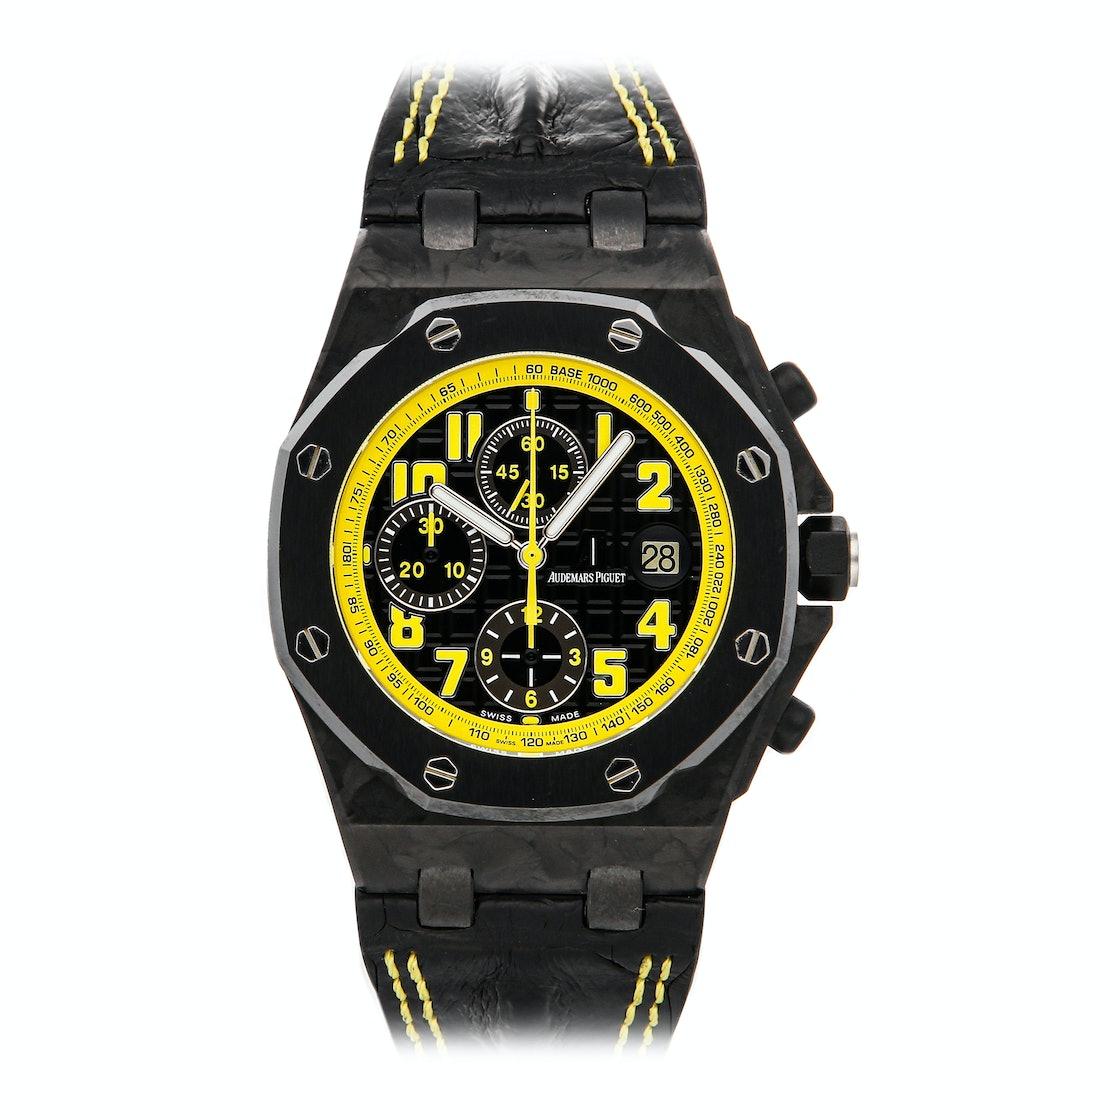 "Audemars Piguet Royal Oak Offshore Chronograph ""Bumblebee"" 26176FO.OO.D101CR.02"